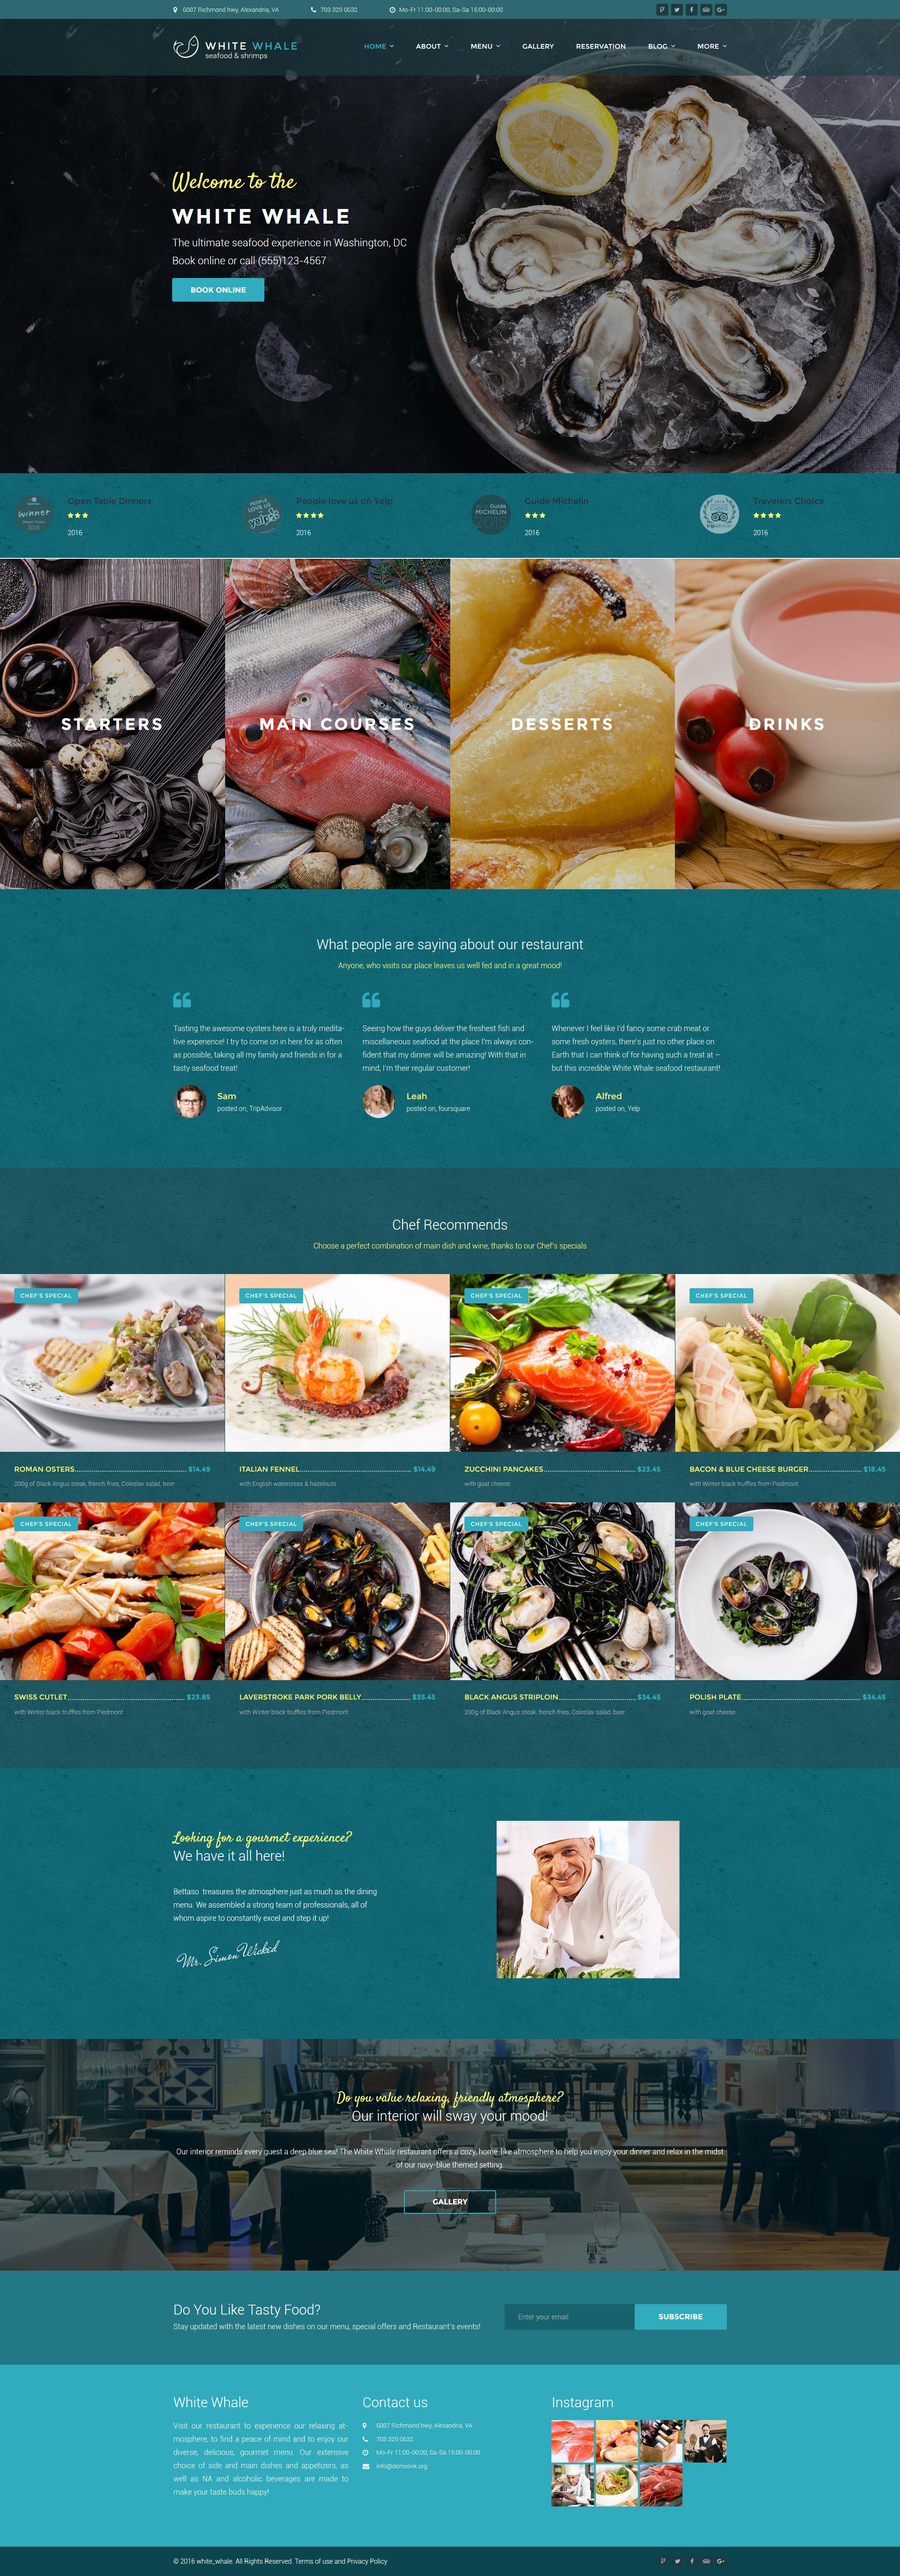 White Whale - Seafood Restaurant WordPress Theme - screenshot